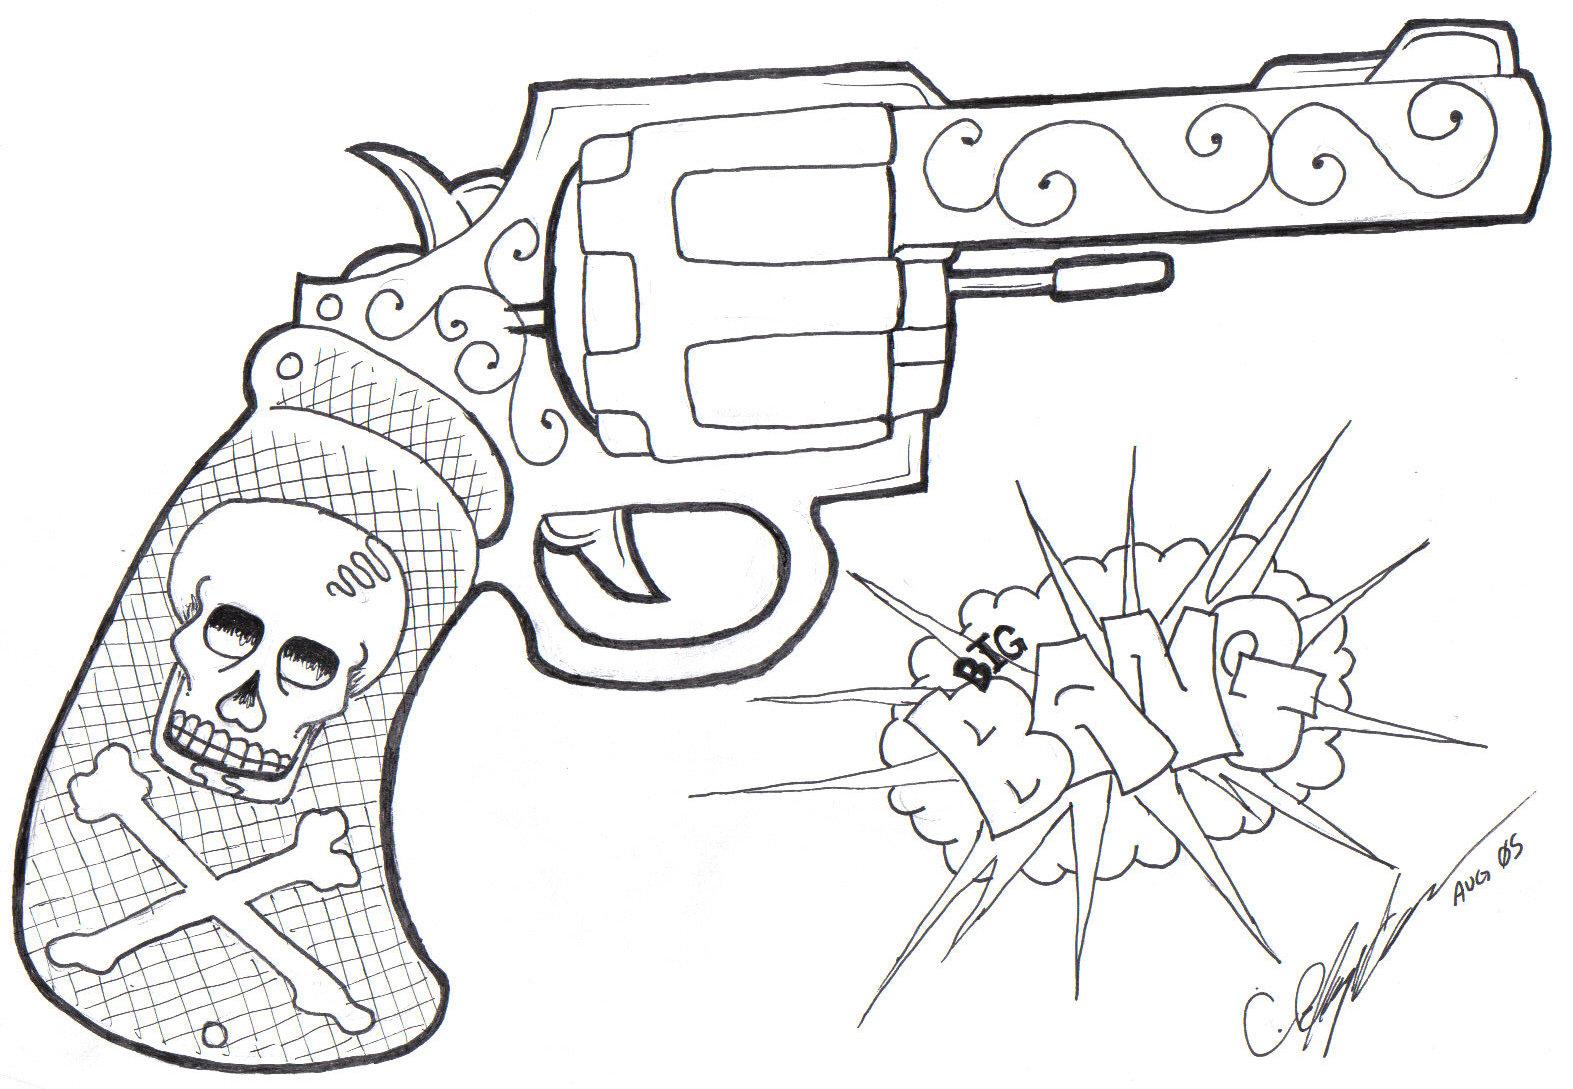 Tattoo Gun Drawing At Getdrawings